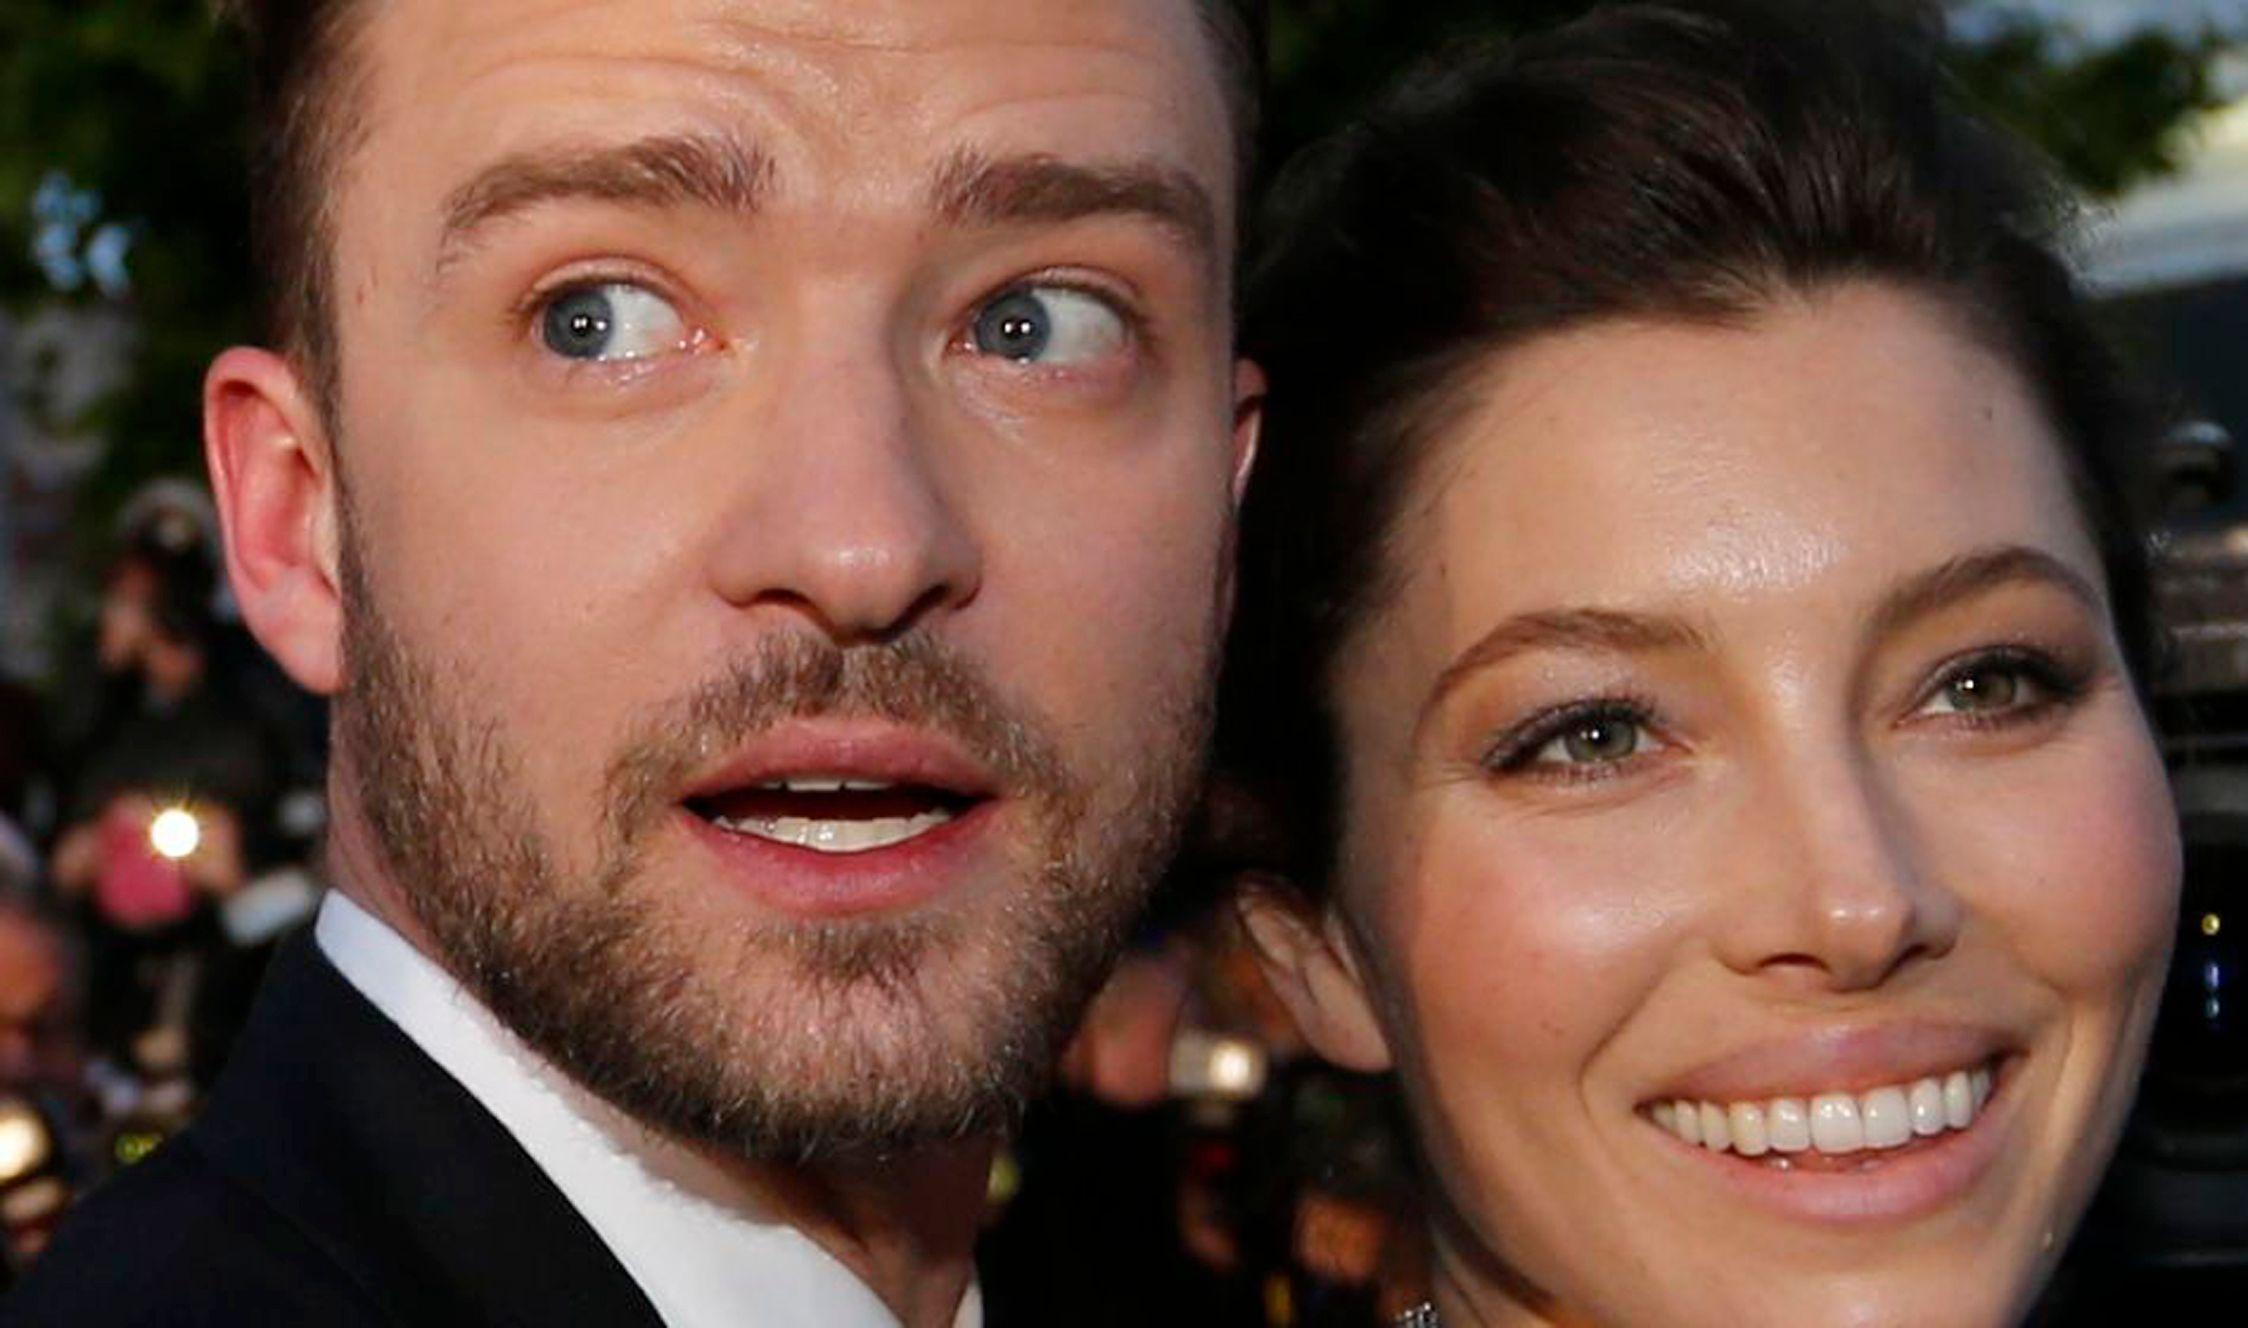 Justin Timberlake et Jessica Biel sont mariés depuis 2012